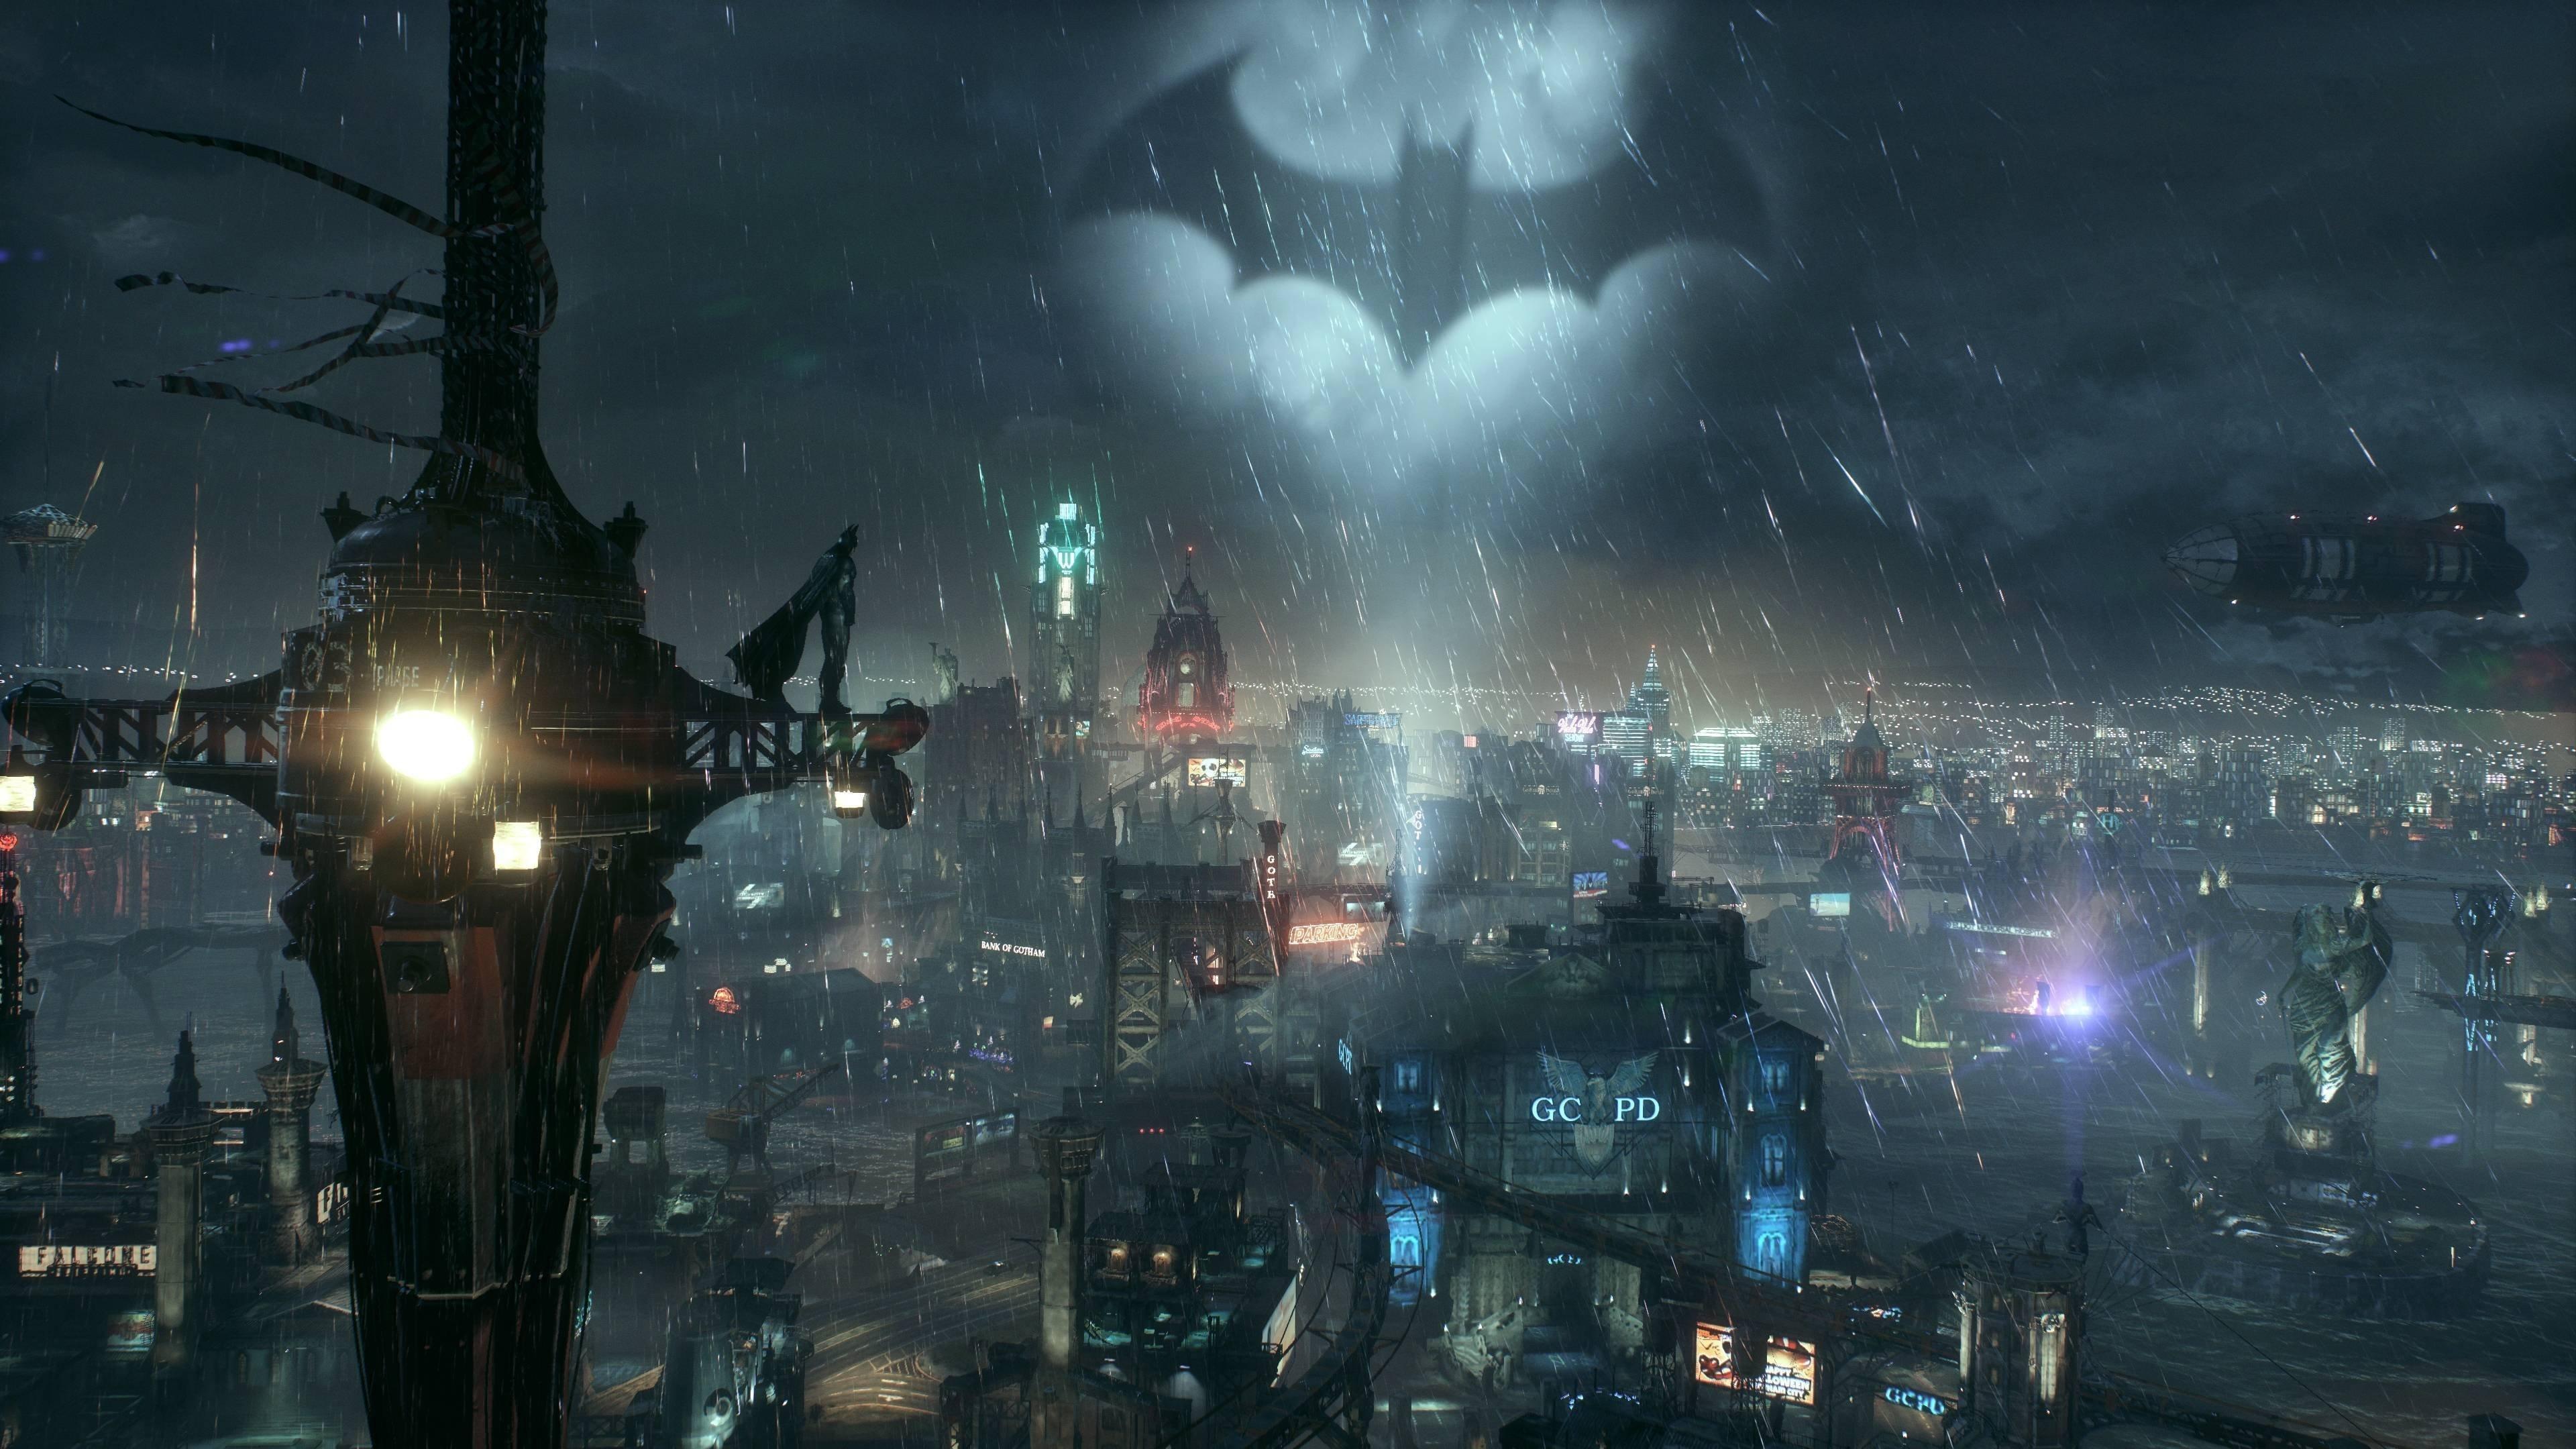 Download 3840x2400 Wallpaper Bat Light Sky Night Batman